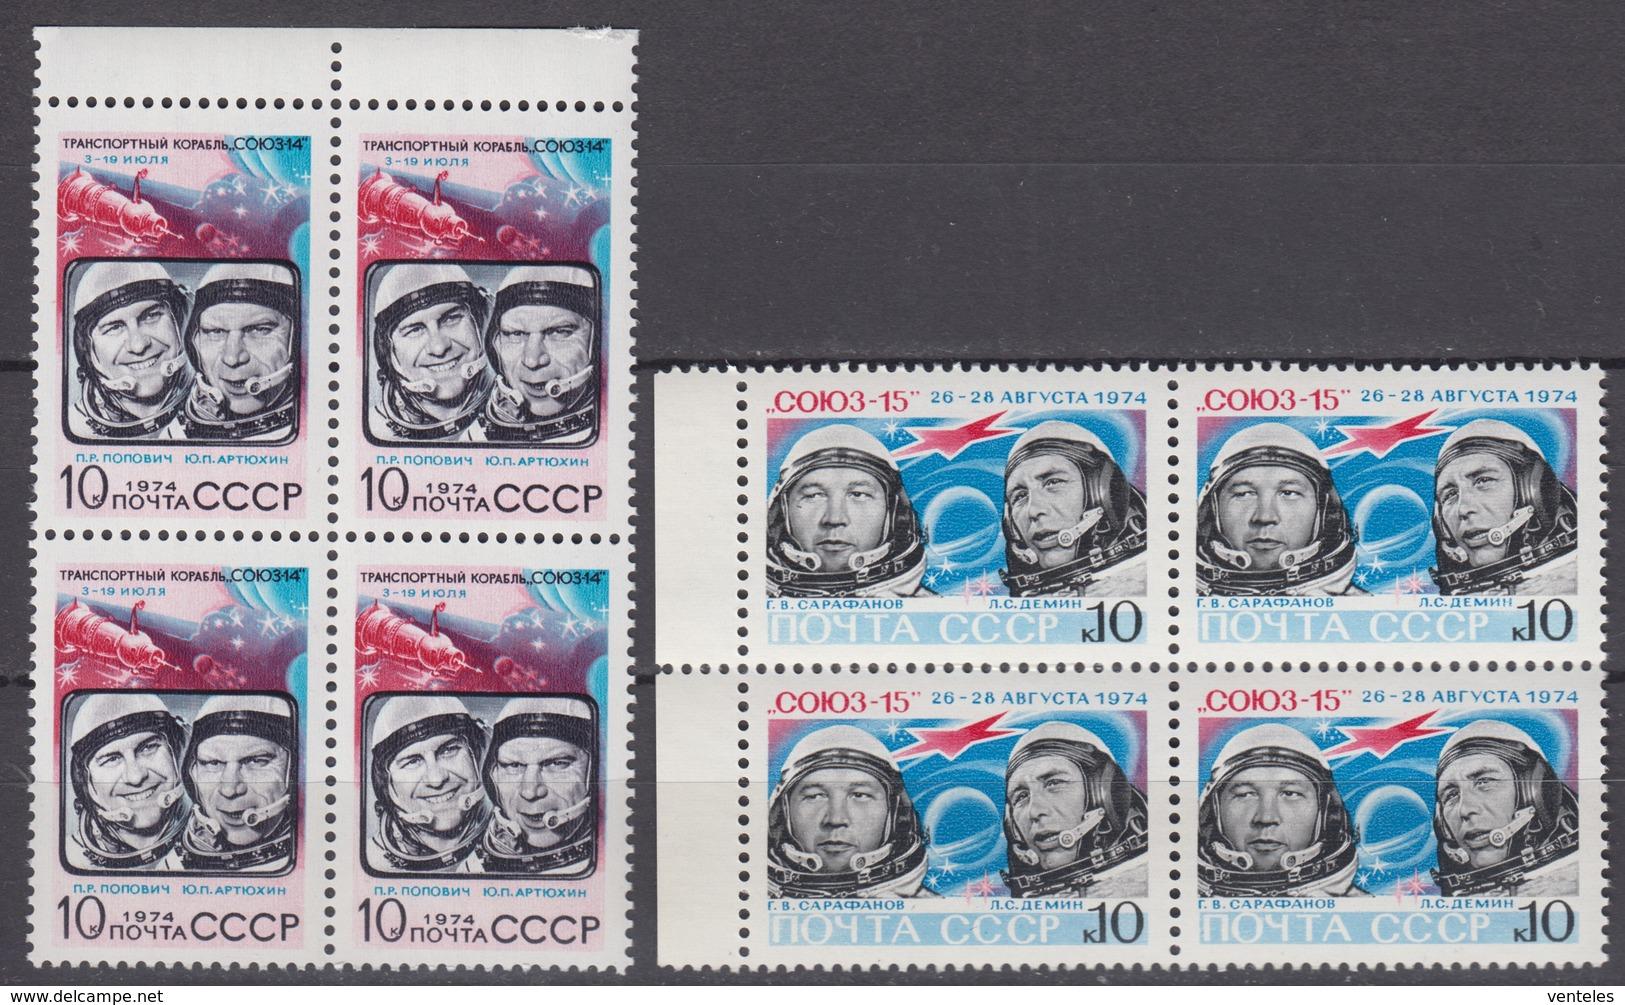 Russia, USSR 28.10.1974BLOCKS OF 4 Mi # 4295-96, Soyuz 14 &Soyuz 15 Space FlightMNH OG - Nuevos